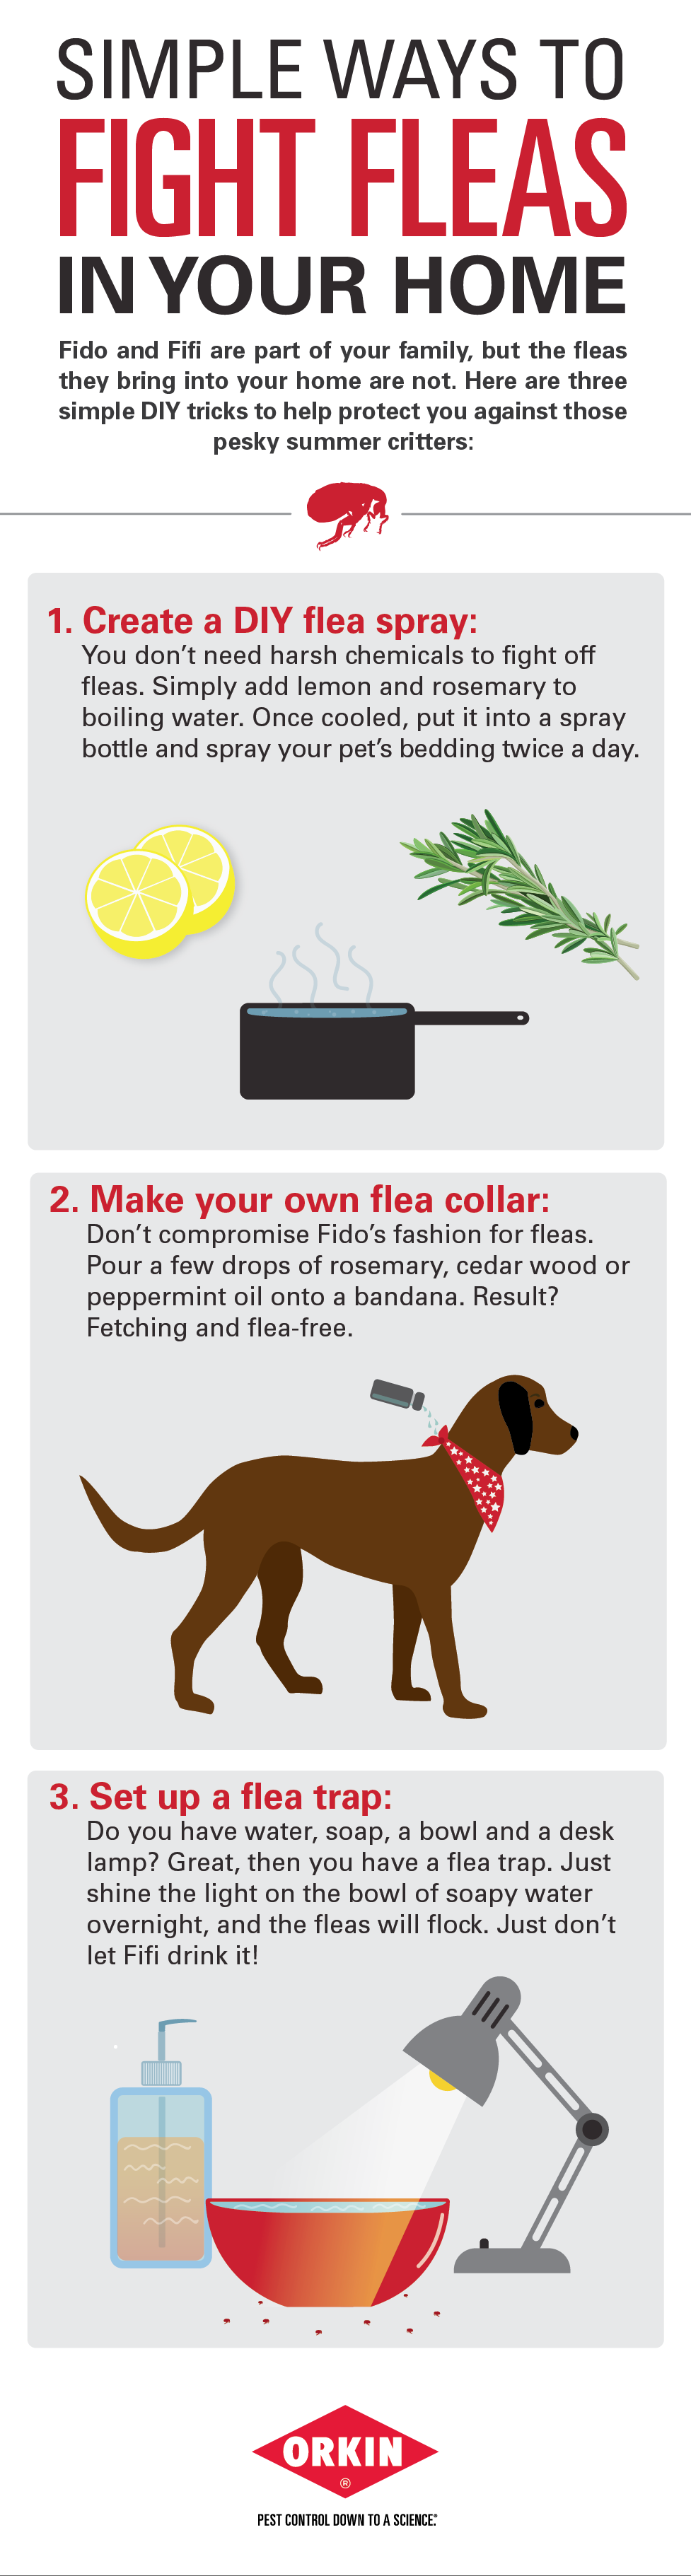 3 Simple Ways To Fight Fleas Diy Fleas Pets Dog Remedies